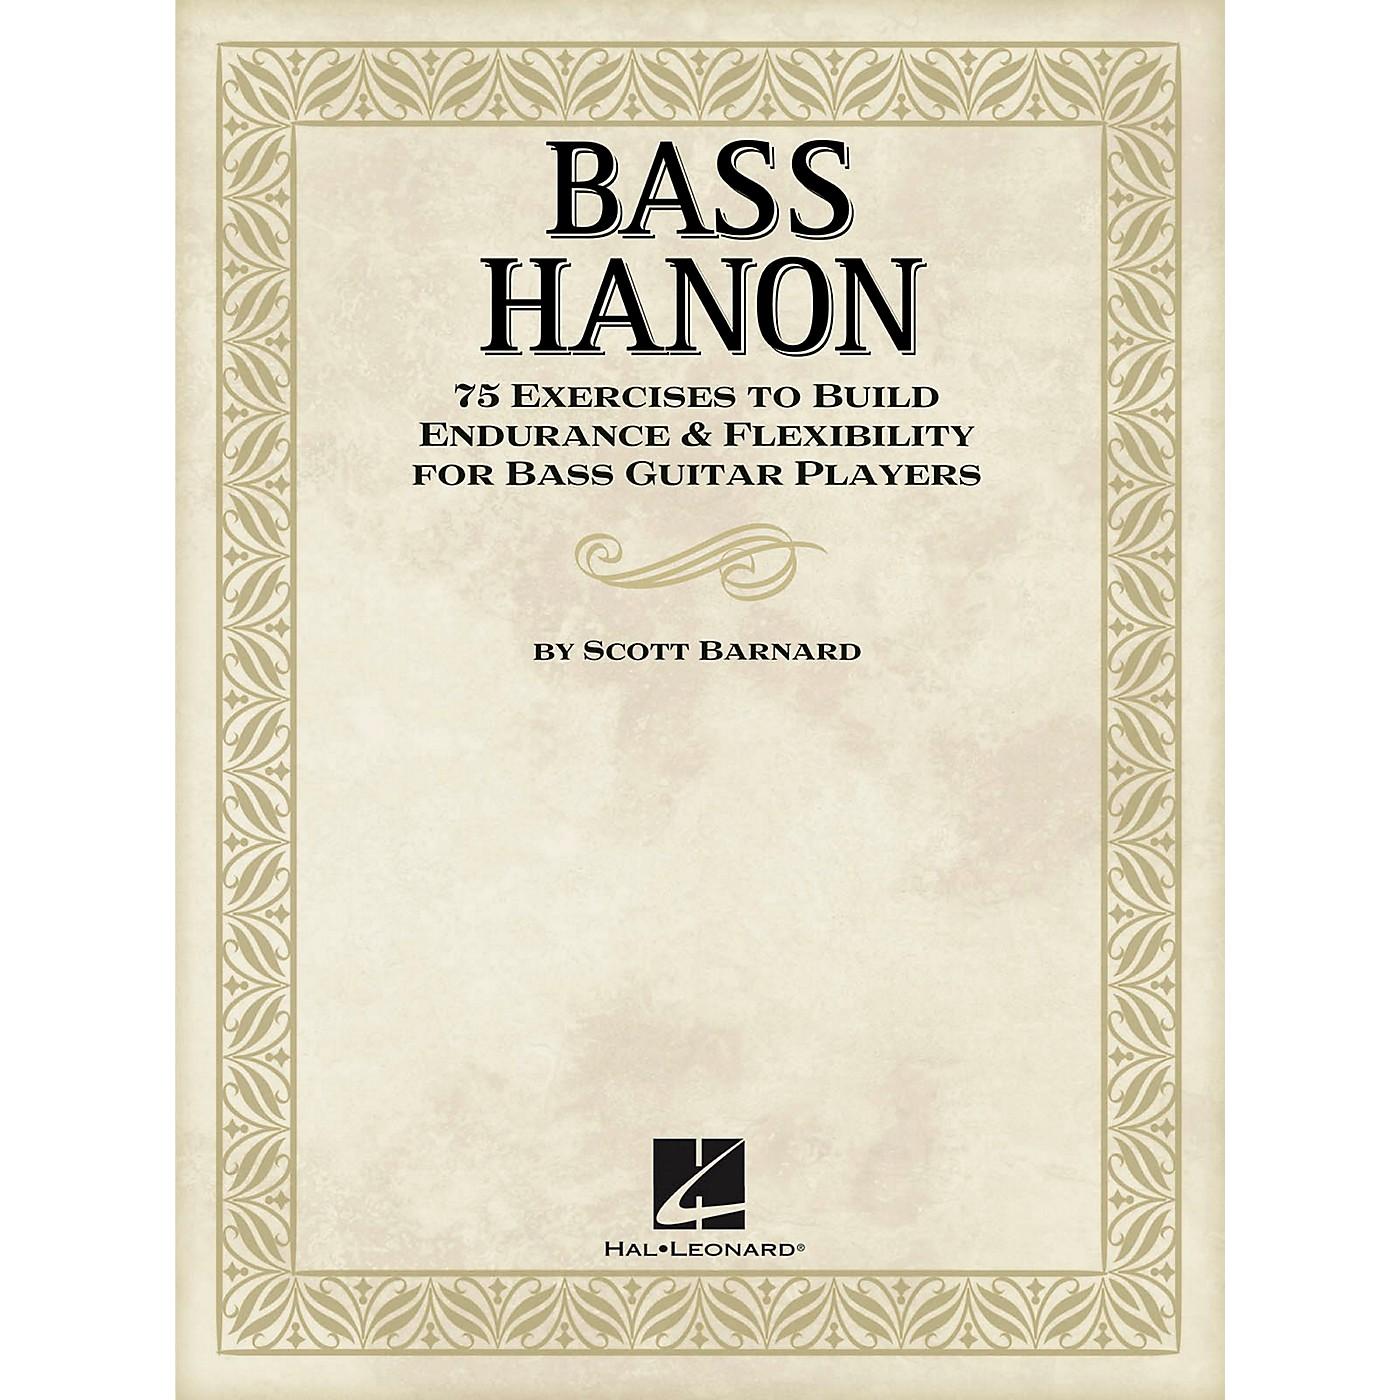 Hal Leonard Bass Hanon - 75 Exercises to Build Endurance and Flexibility for Bass Guitar Players thumbnail